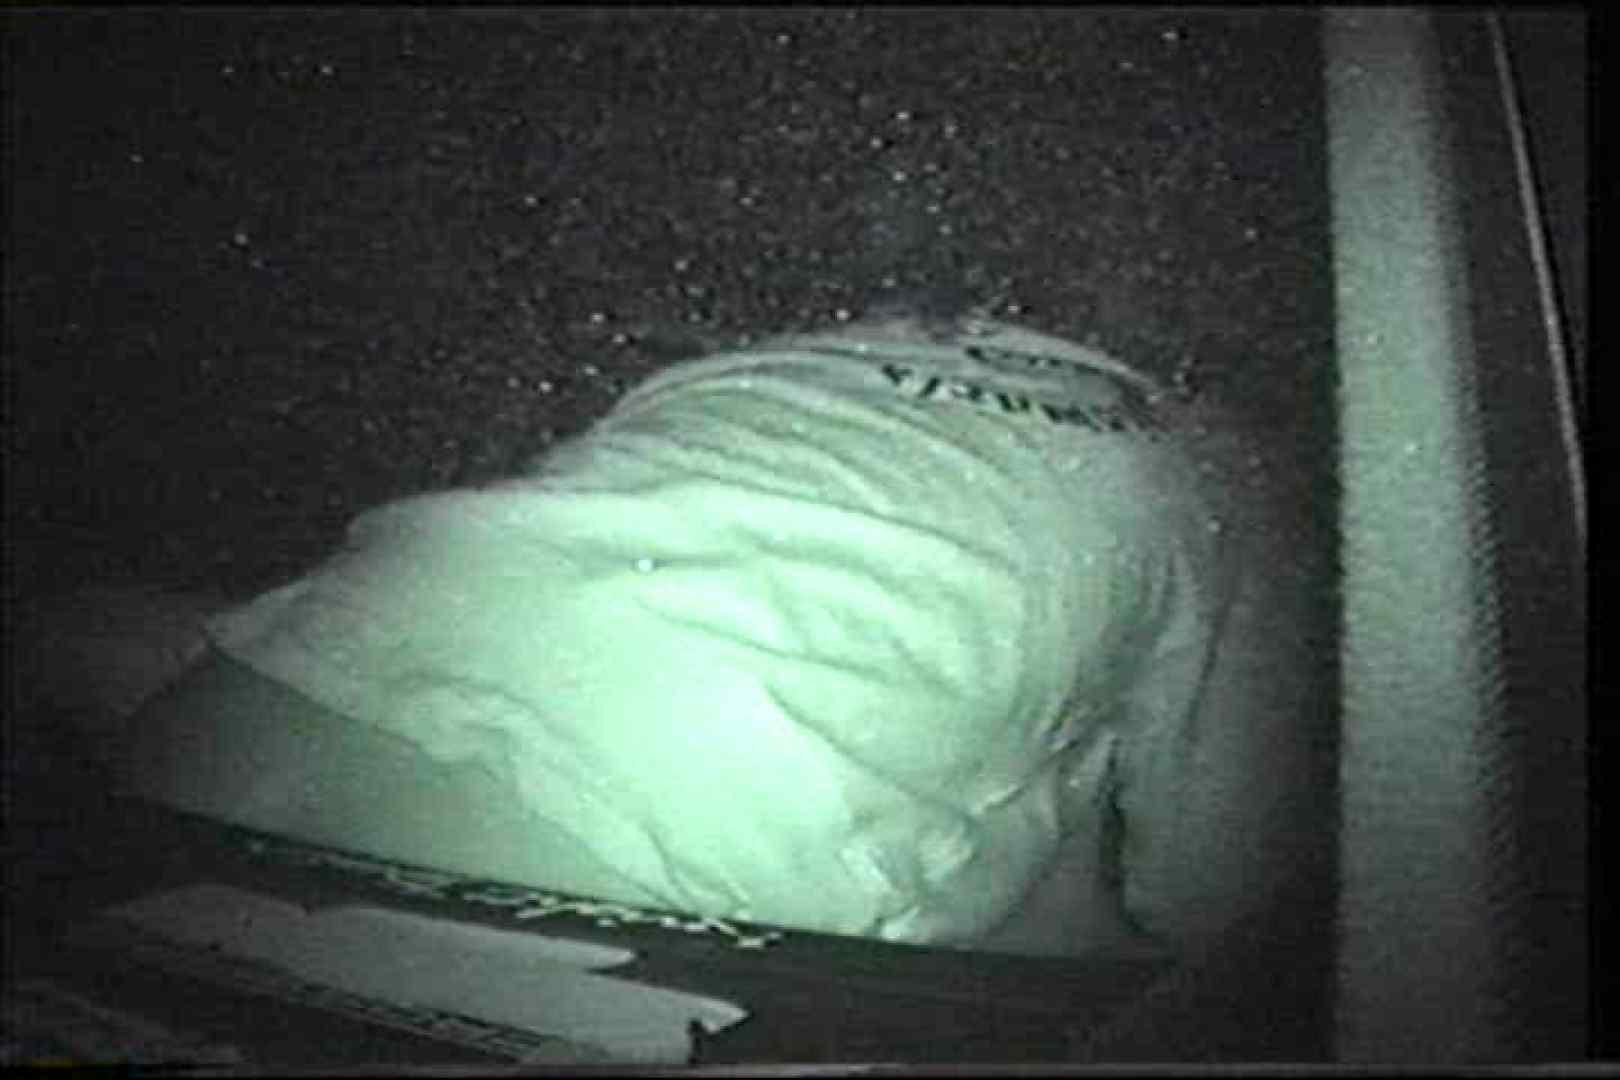 MASAさんの待ち伏せ撮り! 赤外線カーセックスVol.3 カーセックス 盗み撮り動画キャプチャ 71pic 4